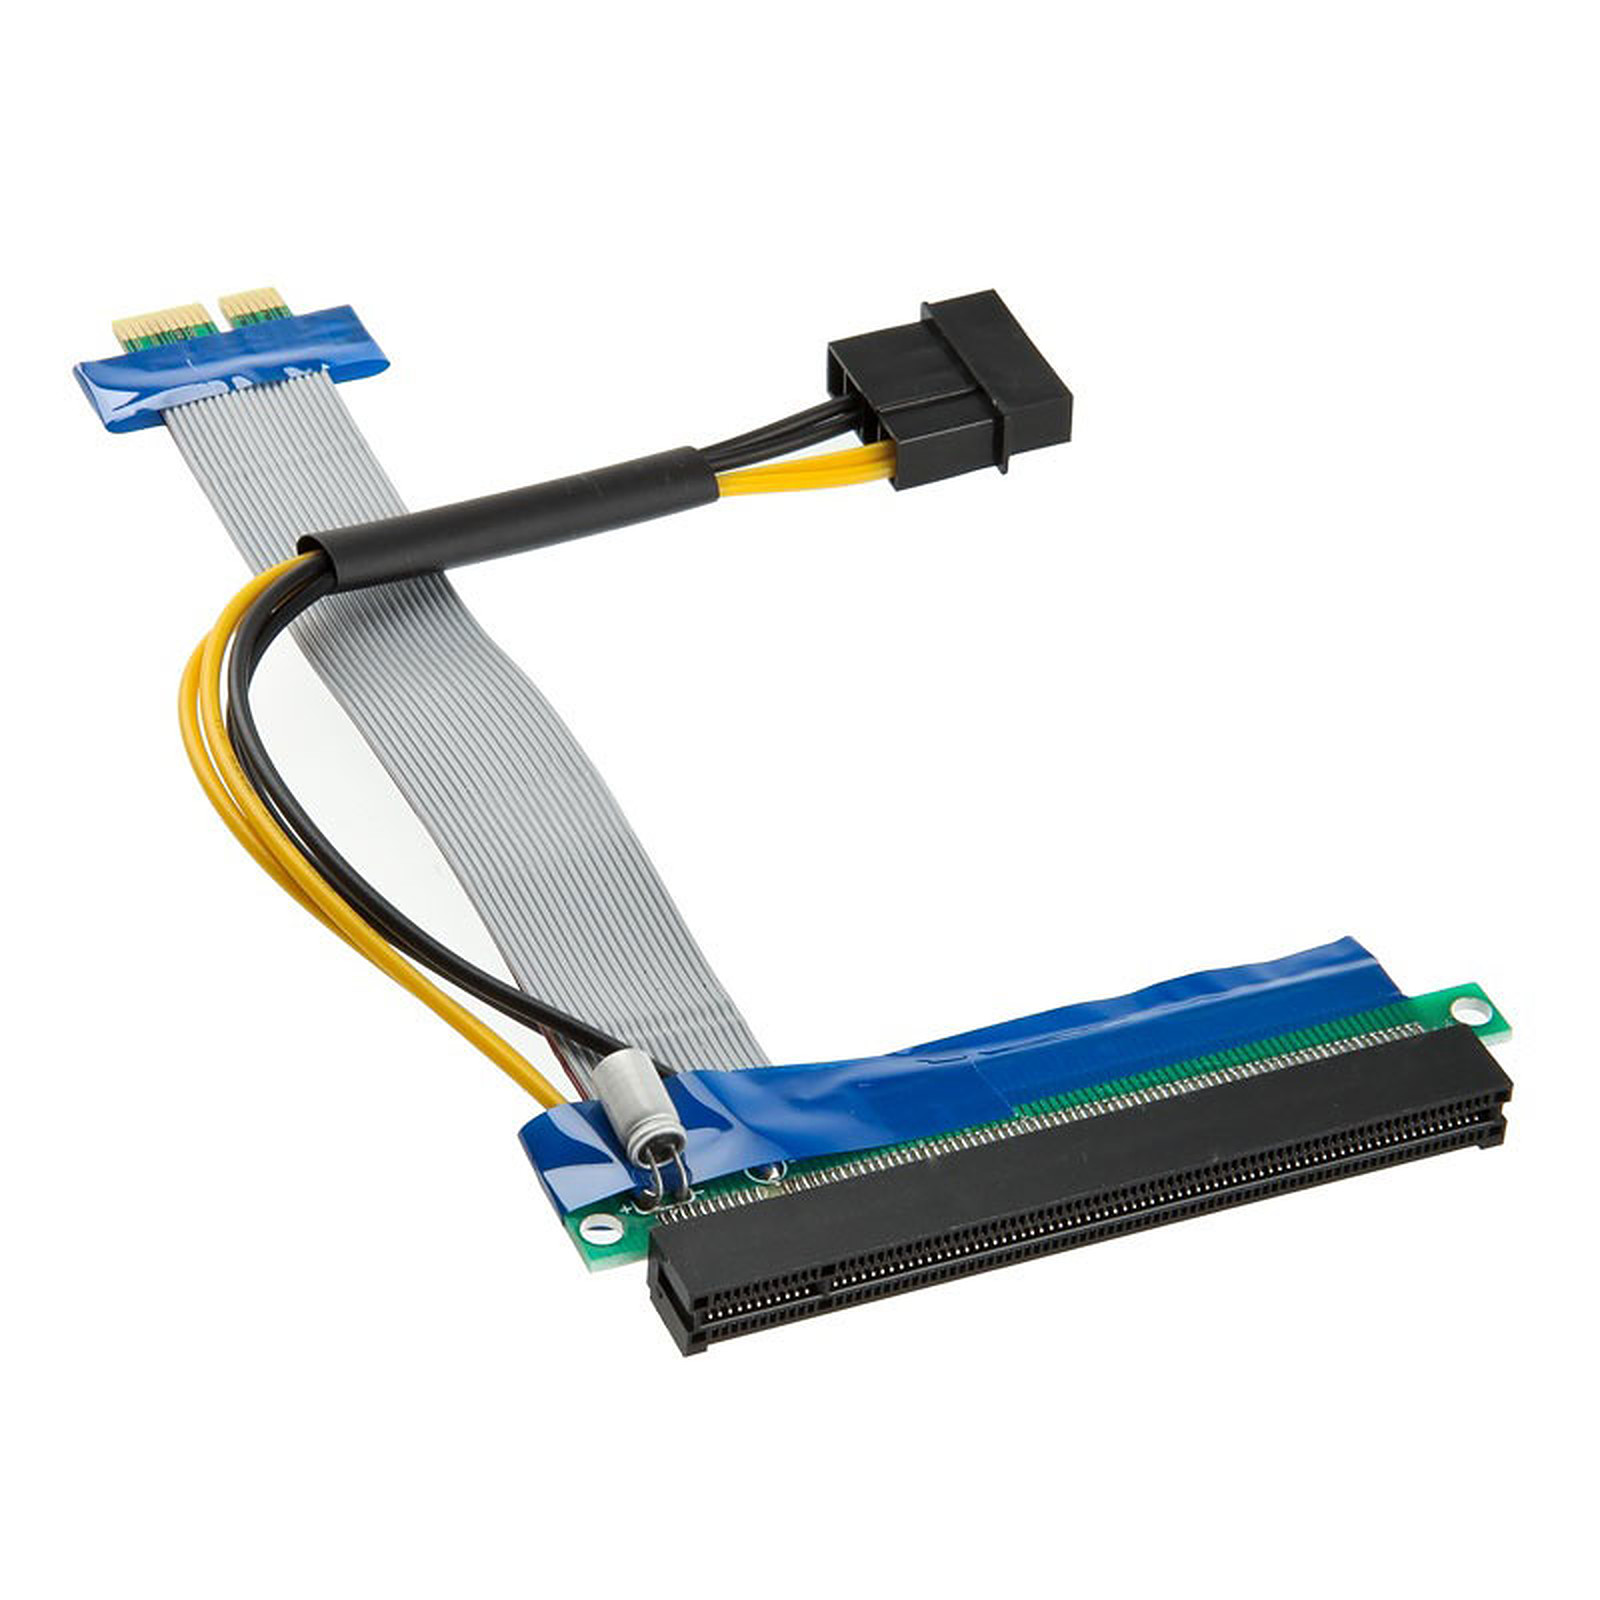 Kolink adaptateur horizontal (riser) PCI-Express 1x vers 16x - Nappe 190 mm